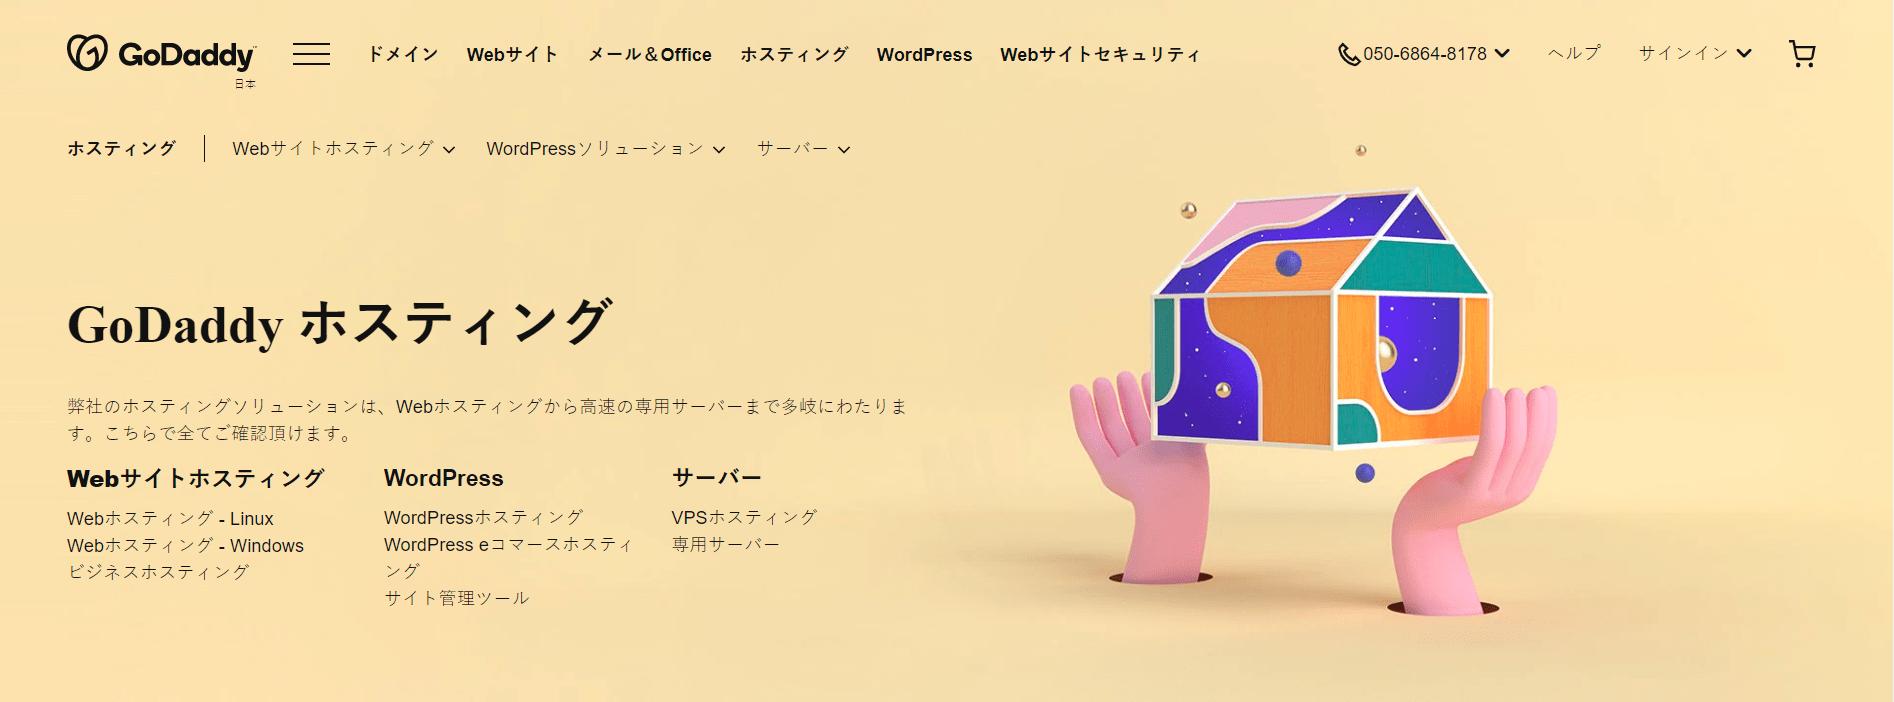 GoDaddyのホームページ